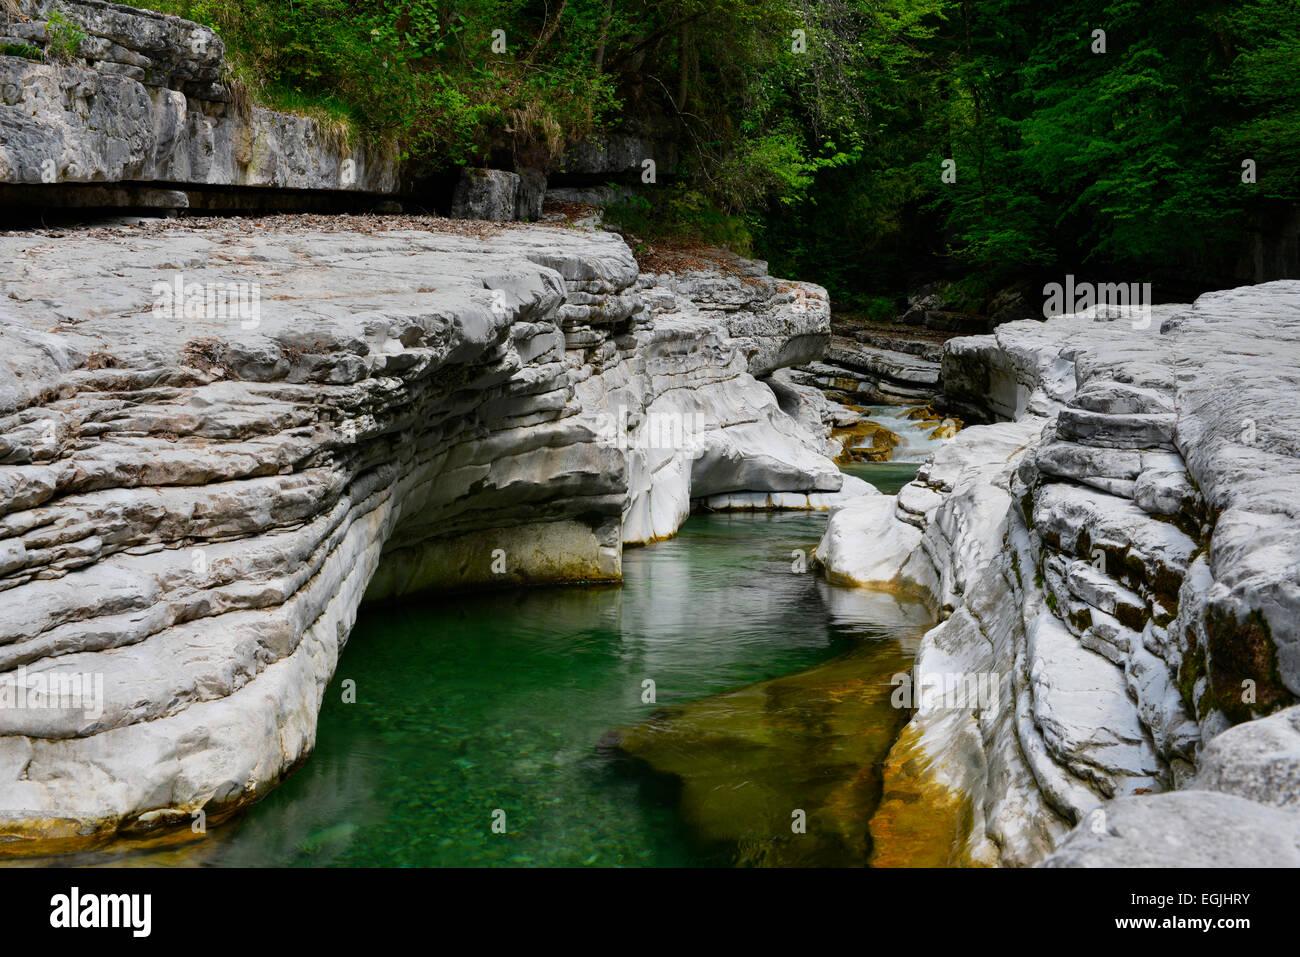 Taugl river, Tauglgries nature reserve, Bad Vigaun, Hallein District, Salzburg, Austria Stock Photo